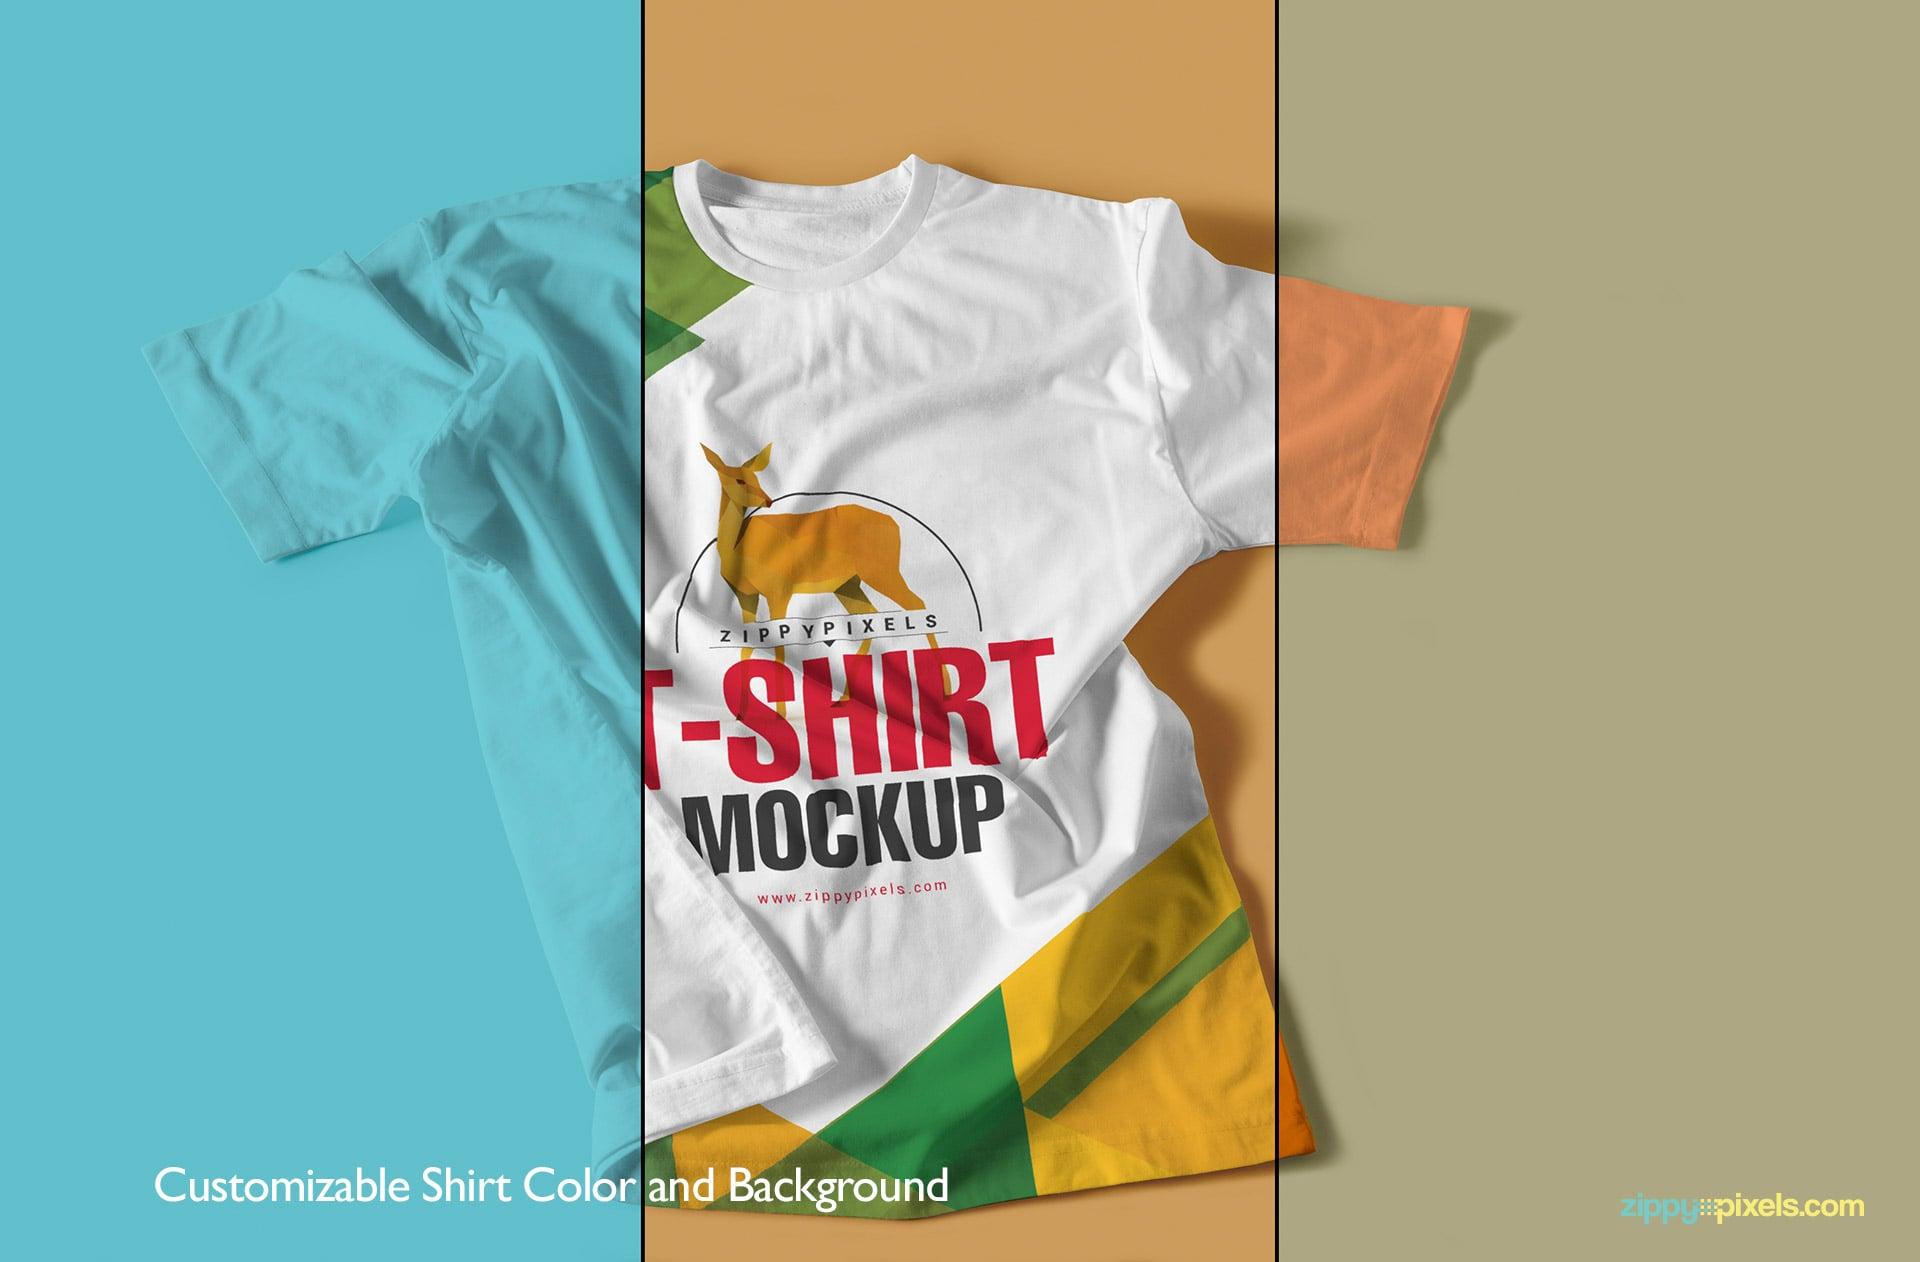 Tee shirts mockups with multiple customization options